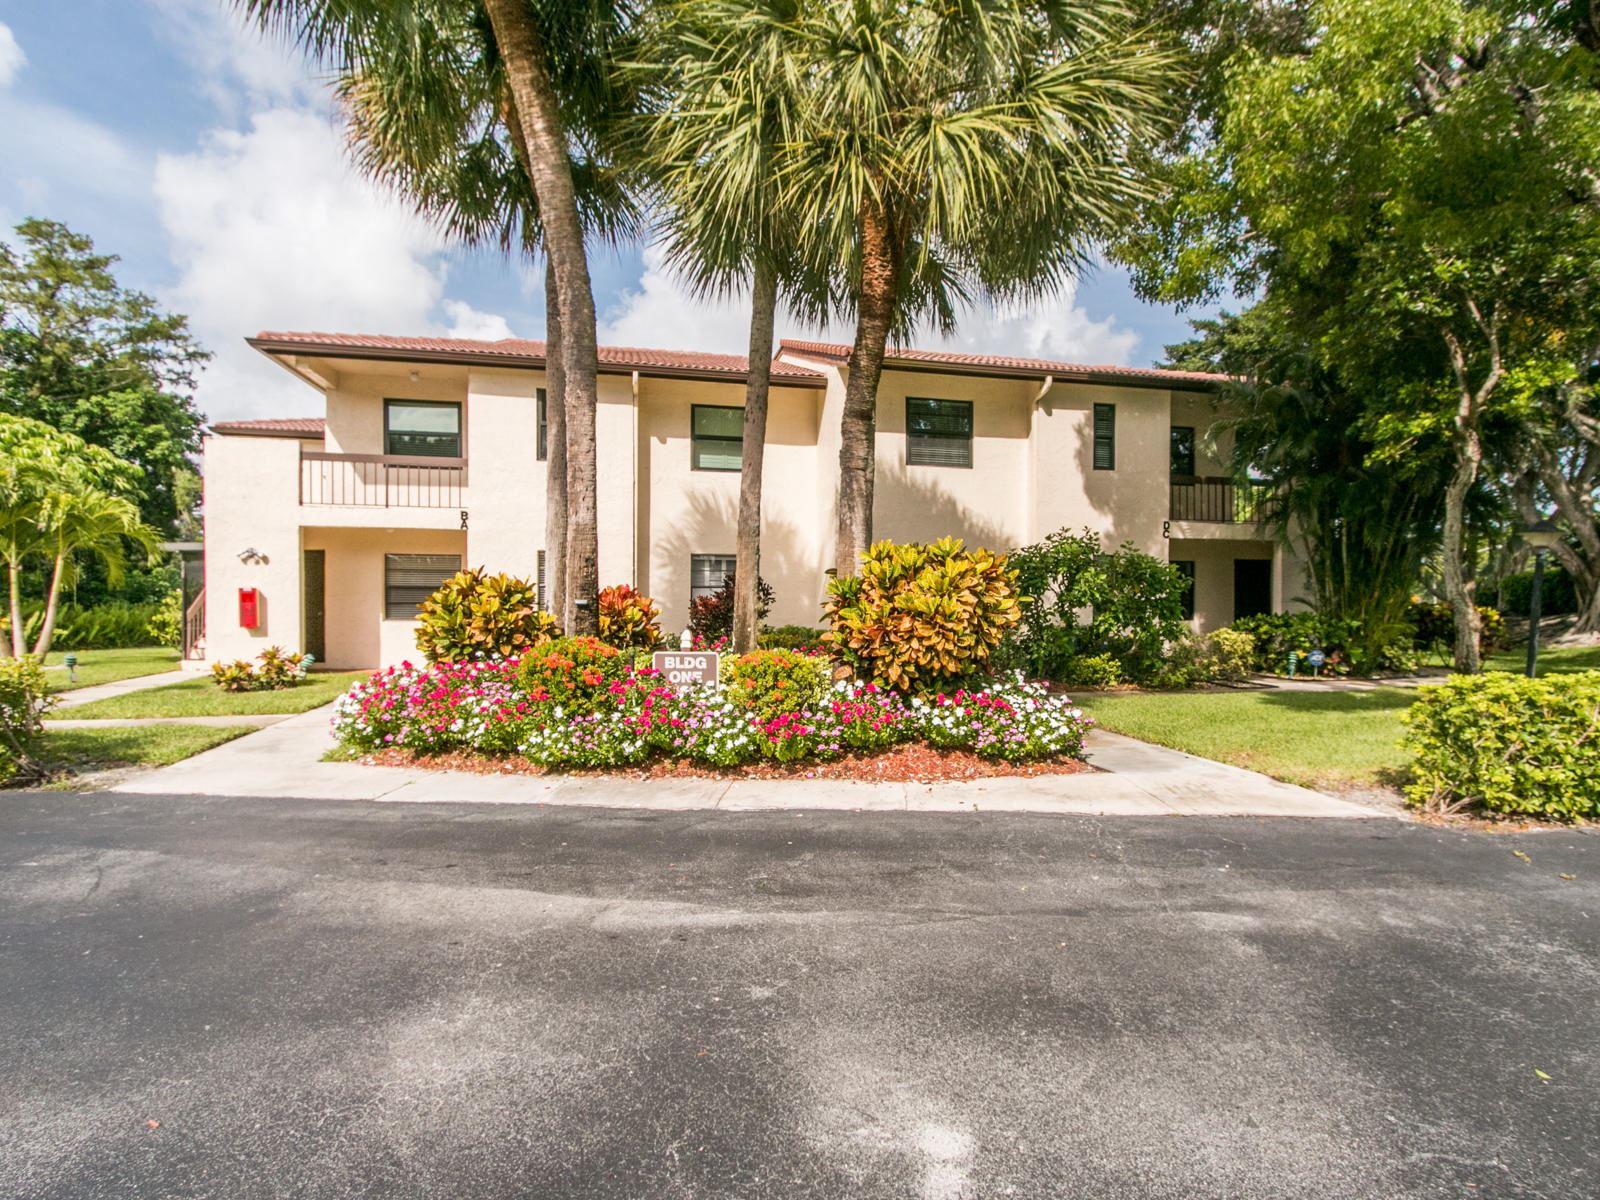 21669 Tall Palm Circle #1a, Boca Raton, FL 33433 - #: RX-10636374